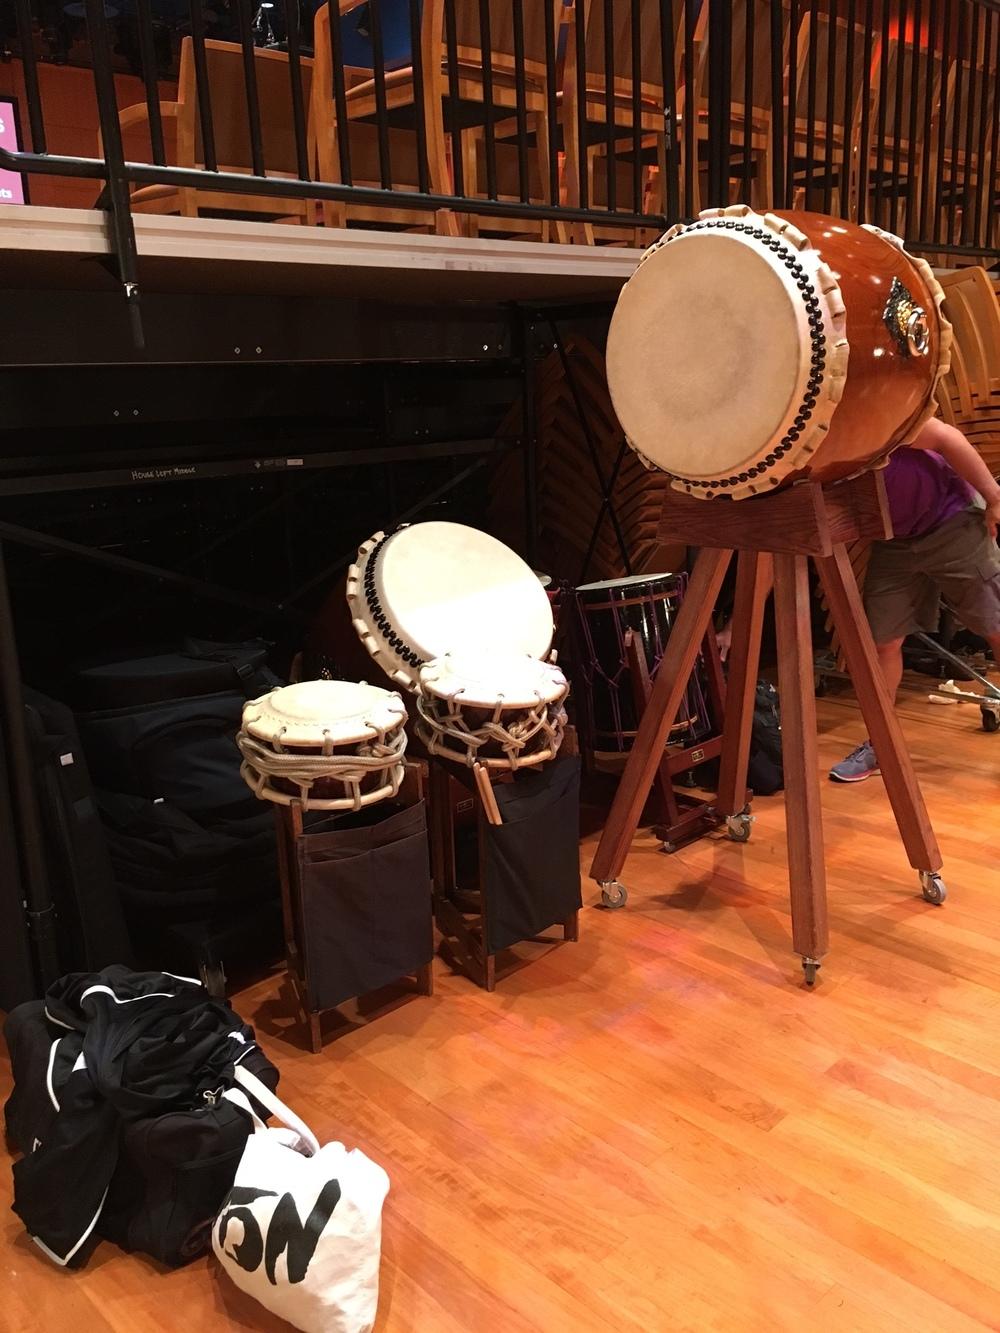 Drums chilling backstage.